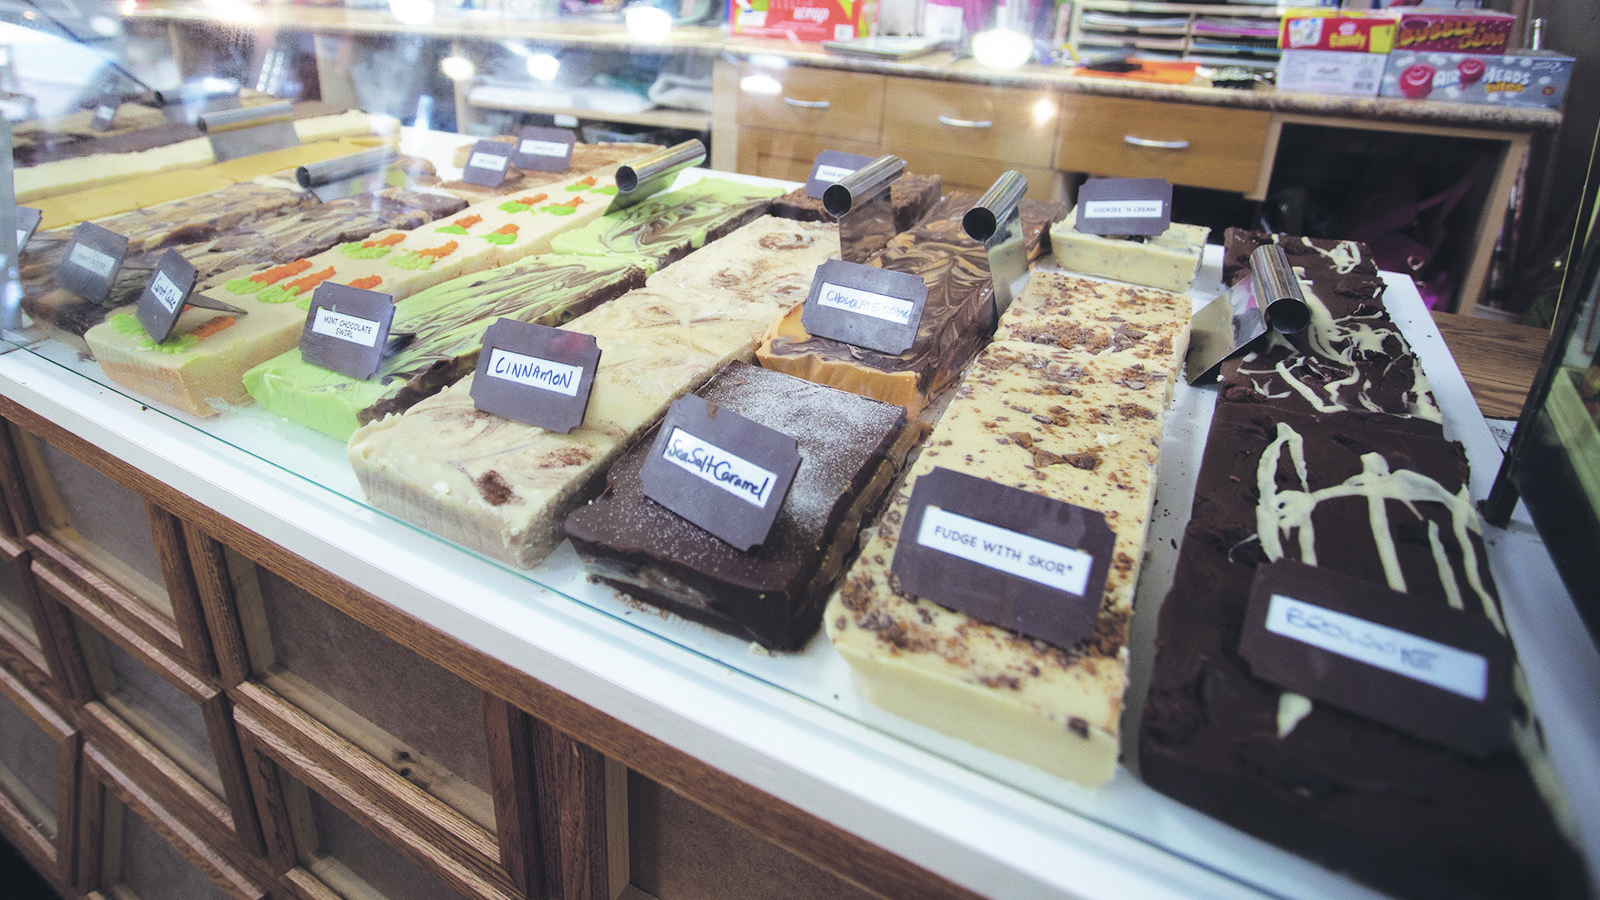 fudge display at I love chocolate retail location